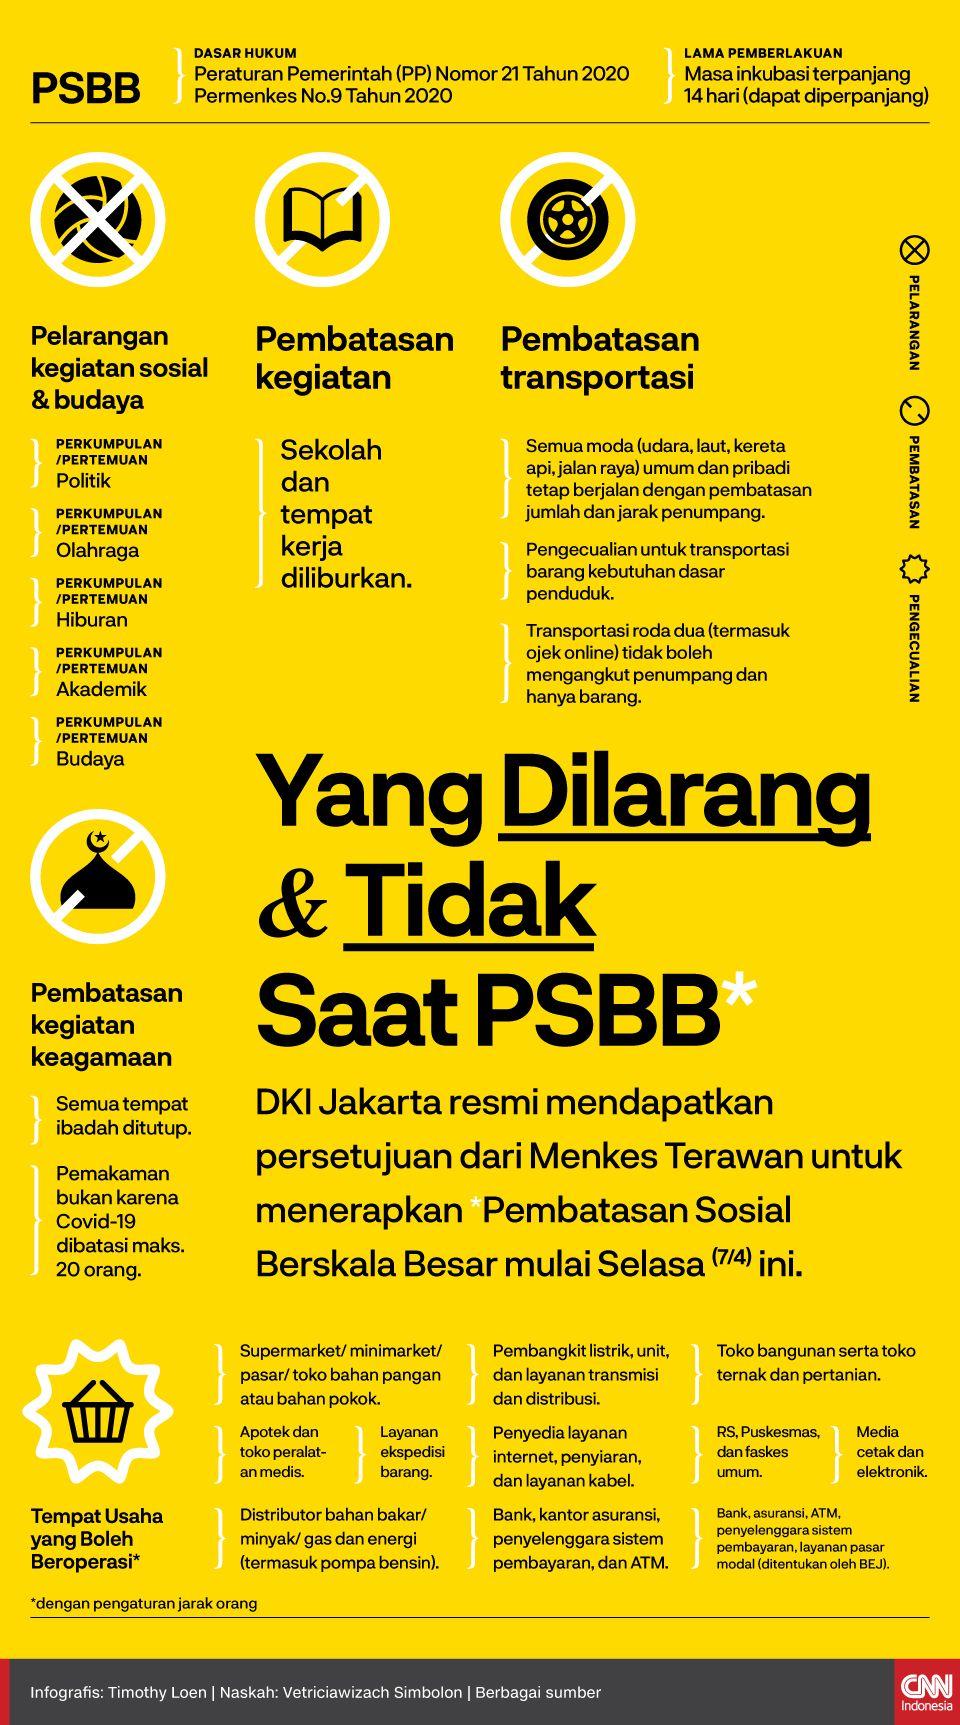 Polisi Pastikan Tak Tutup Jalan Selama PSBB di Jakarta